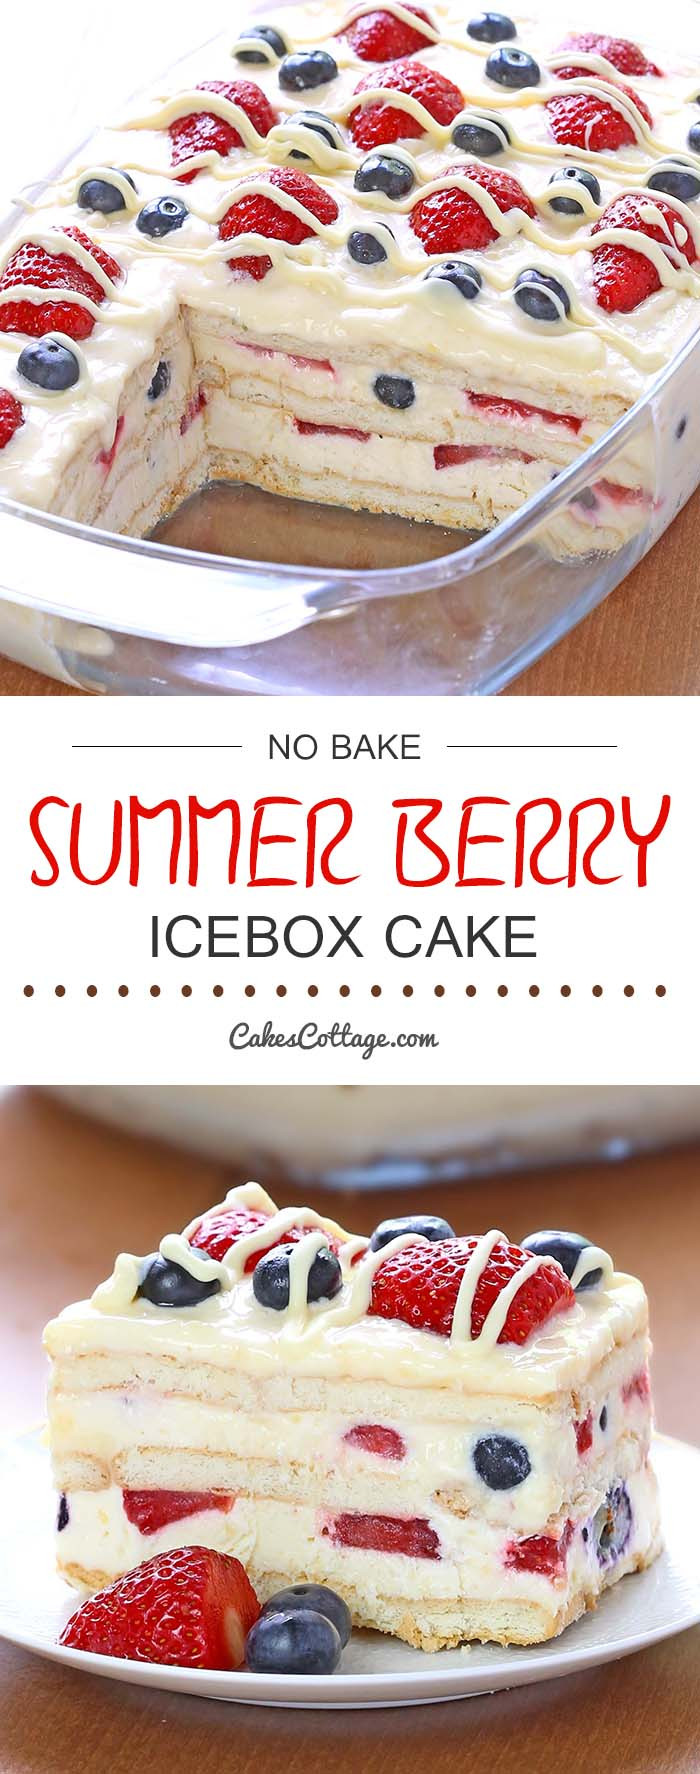 No Bake Desserts For Summer  No Bake Summer Berry Icebox Cake Cakescottage